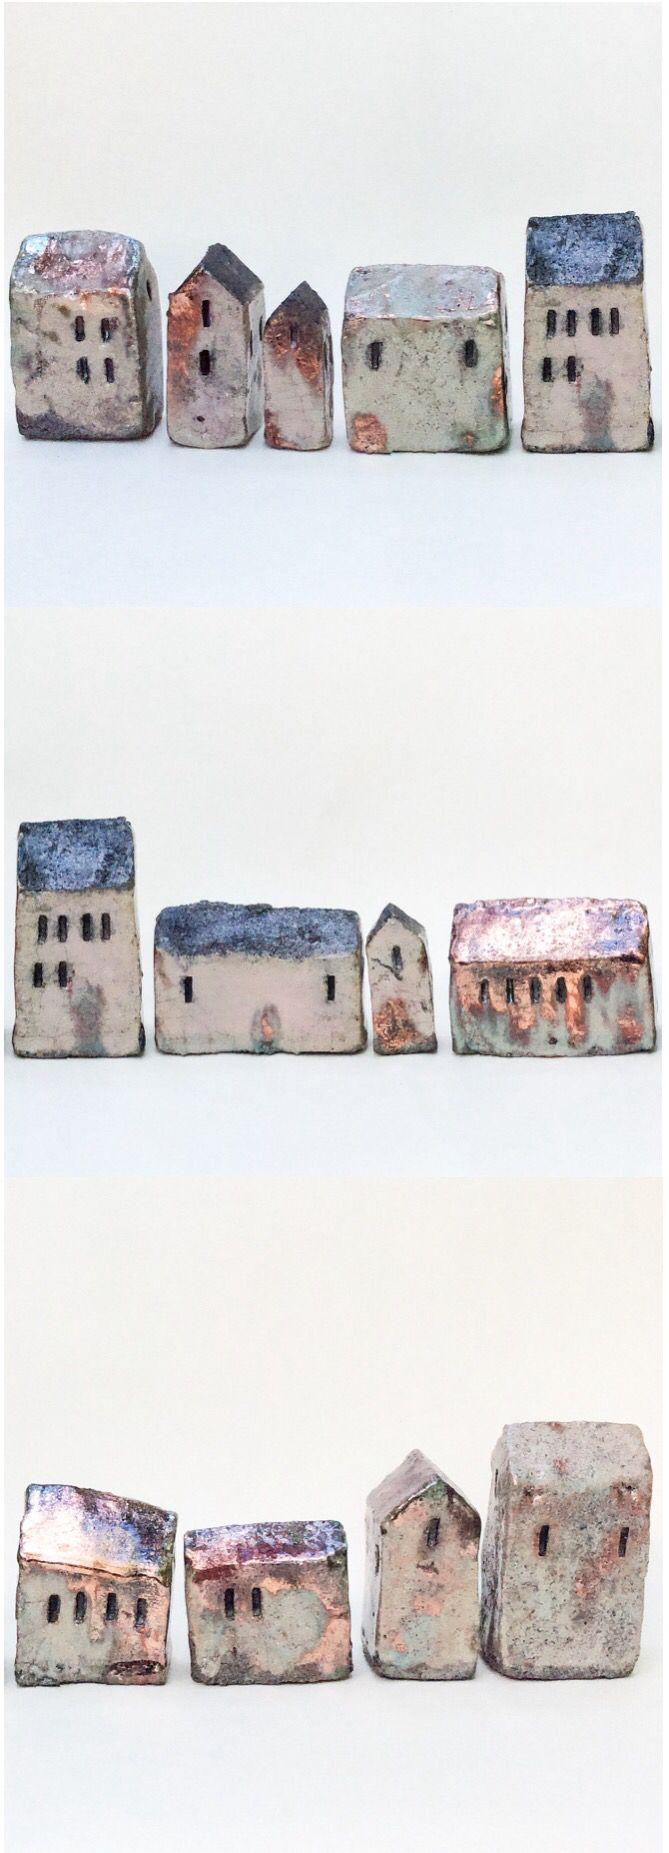 Little #raku houses. #ceramics #asiaceramics